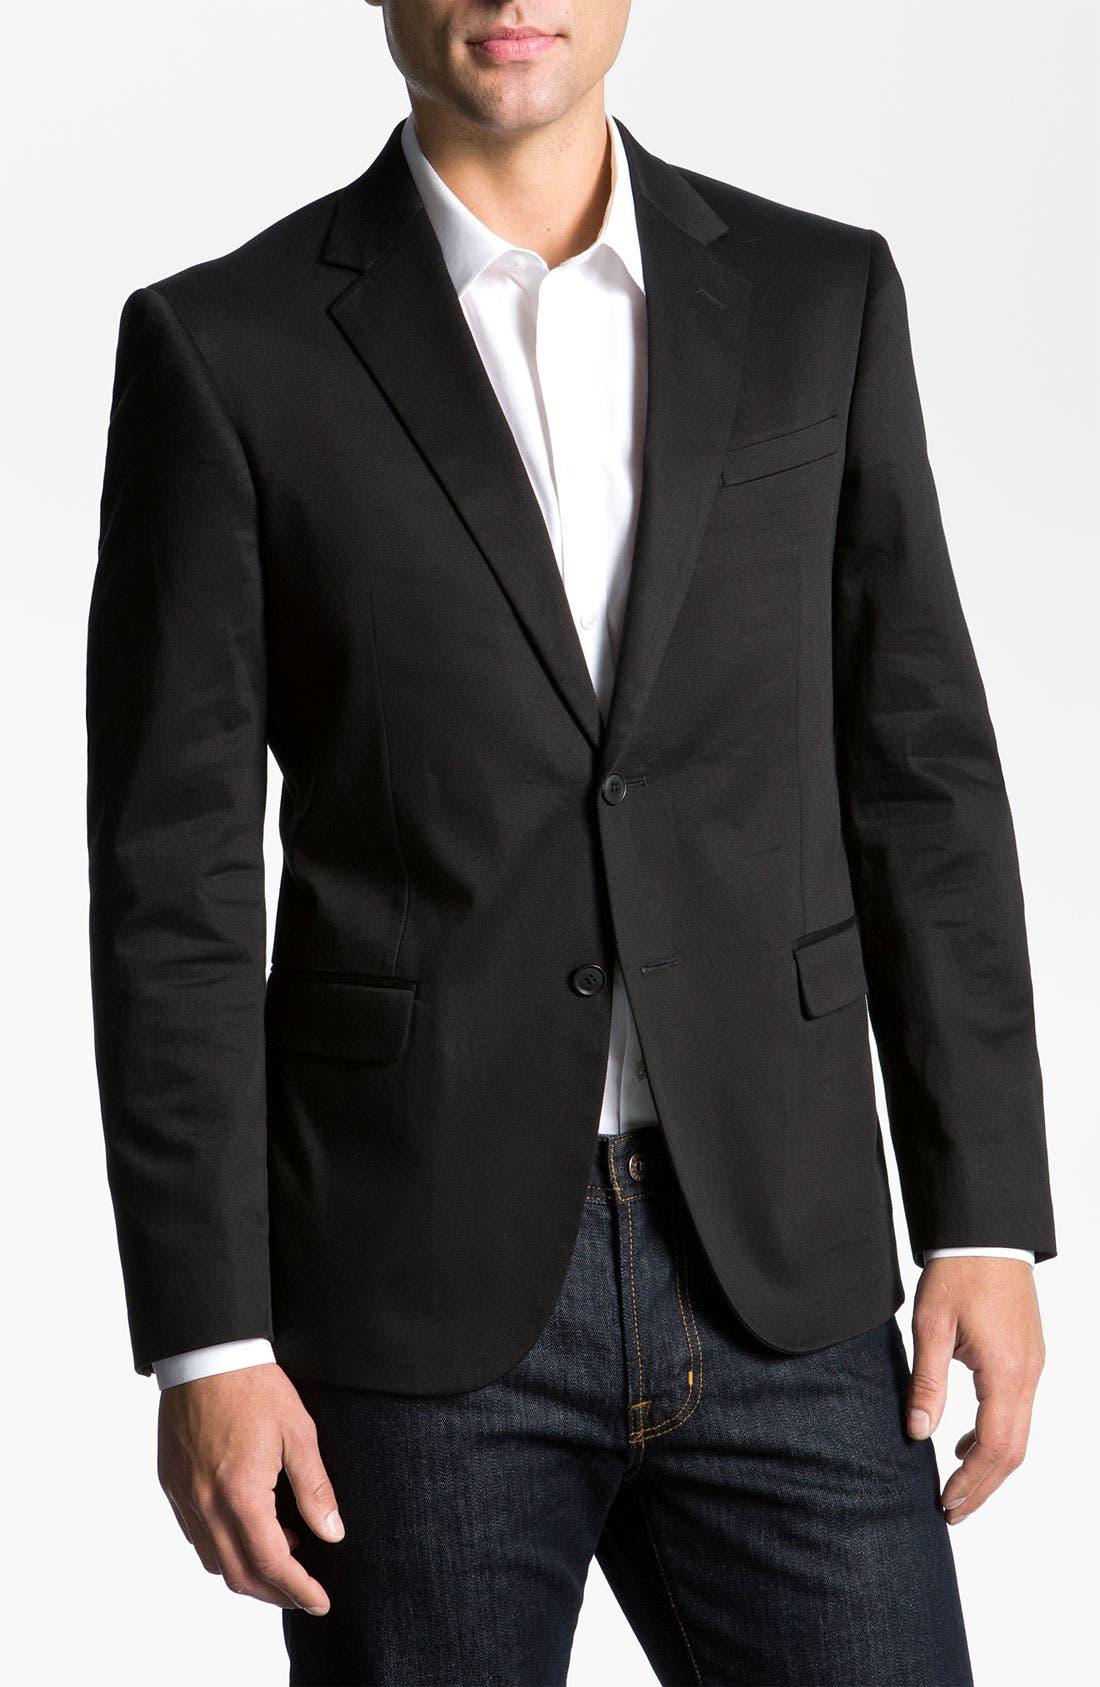 Alternate Image 1 Selected - Calibrate 'Core' Trim Fit Sportcoat